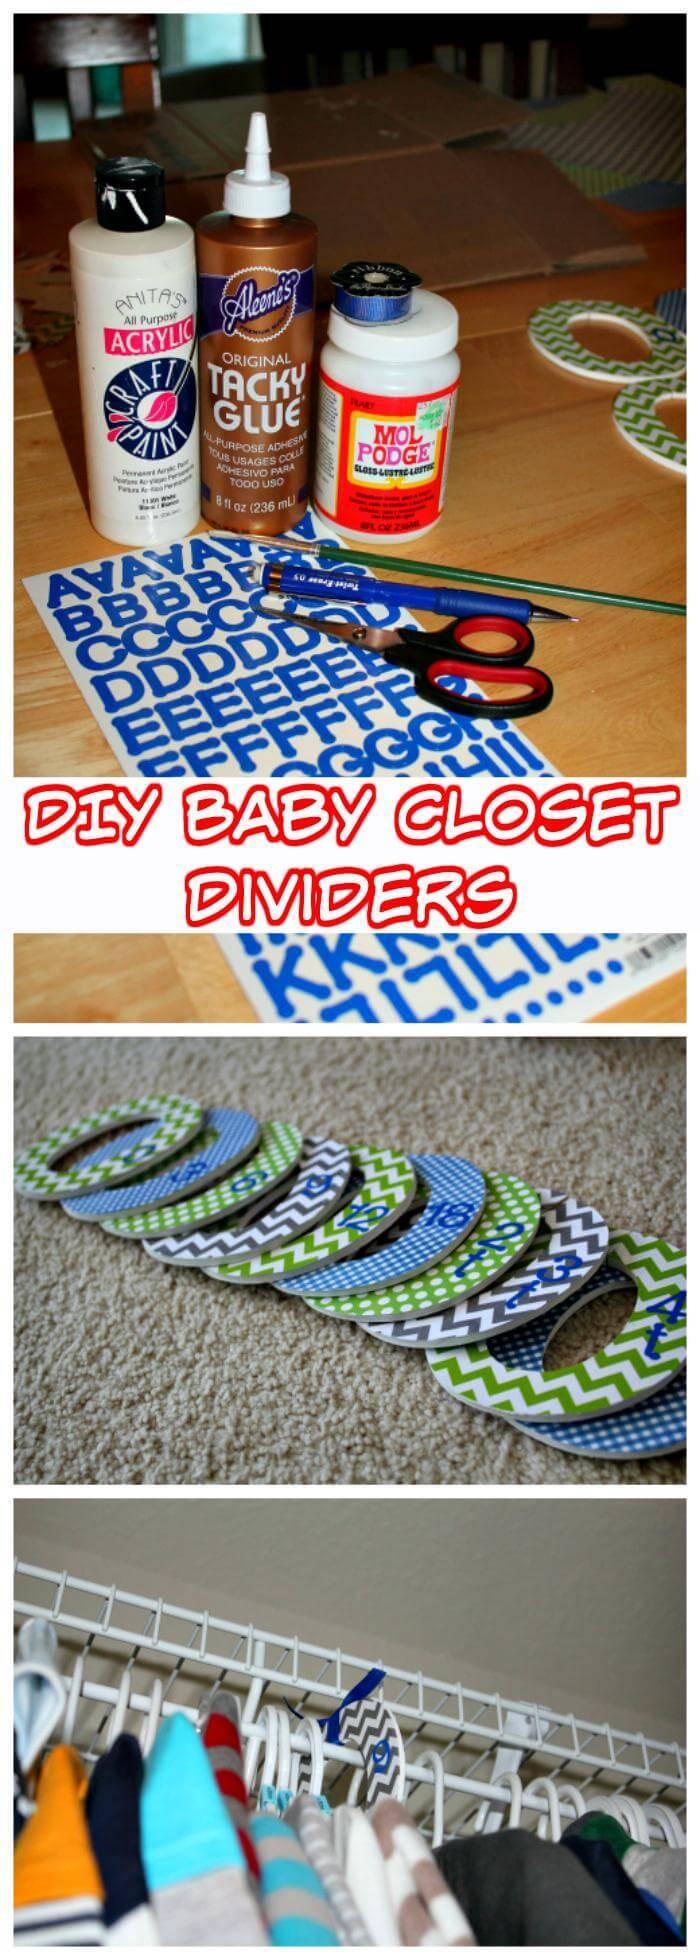 DIY Baby Closet Dividers